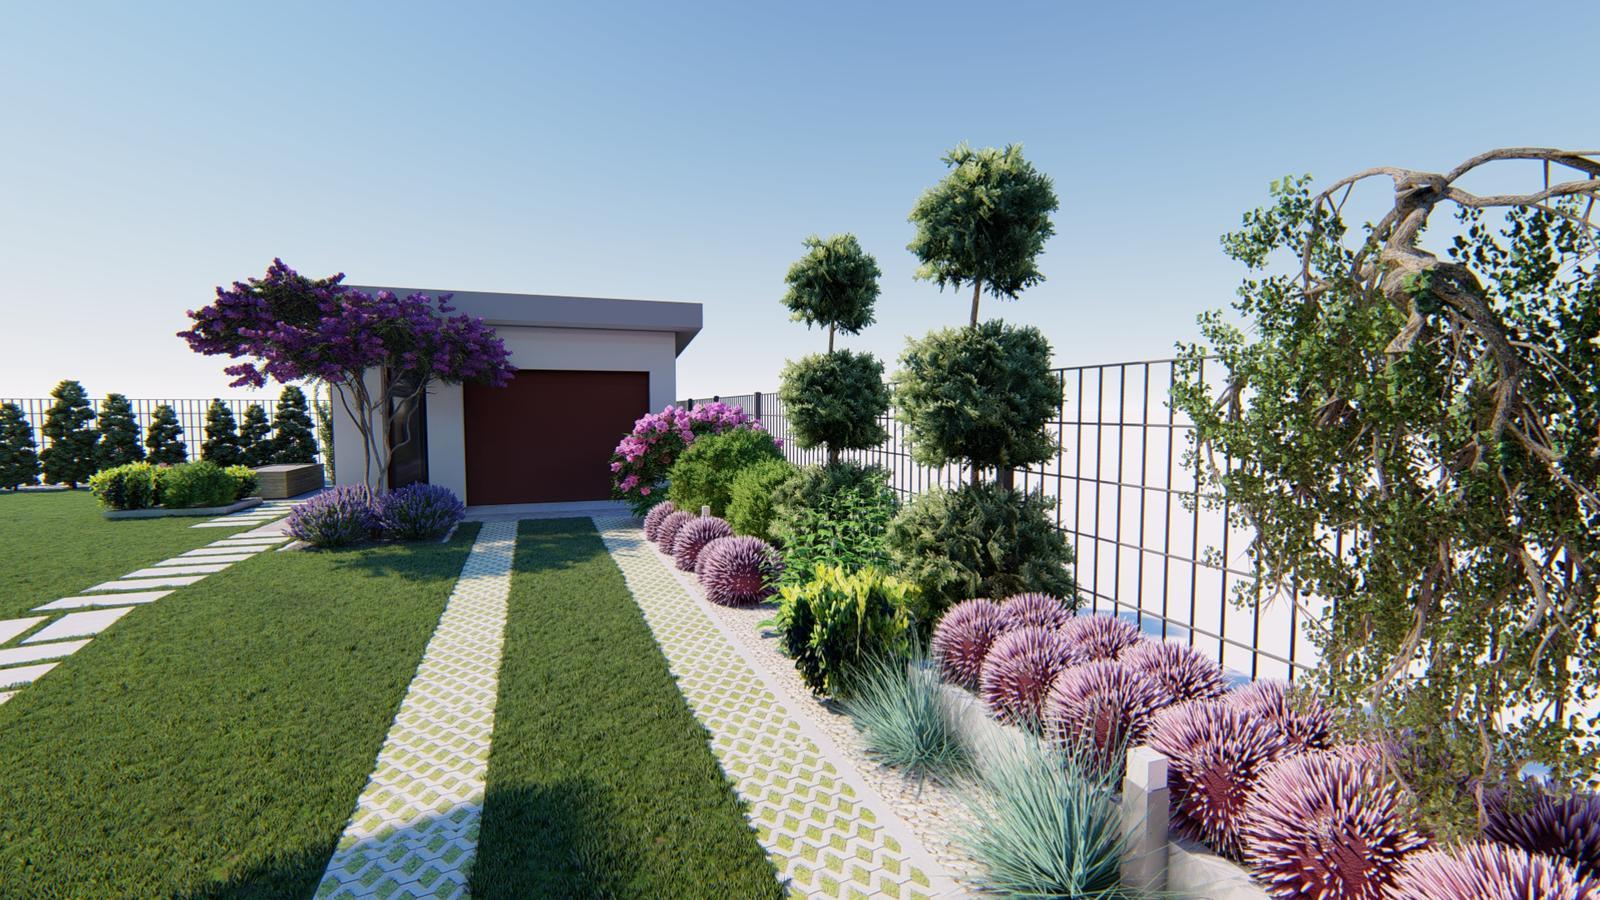 Návrh záhrady rodinného domu. - Obrázok č. 5